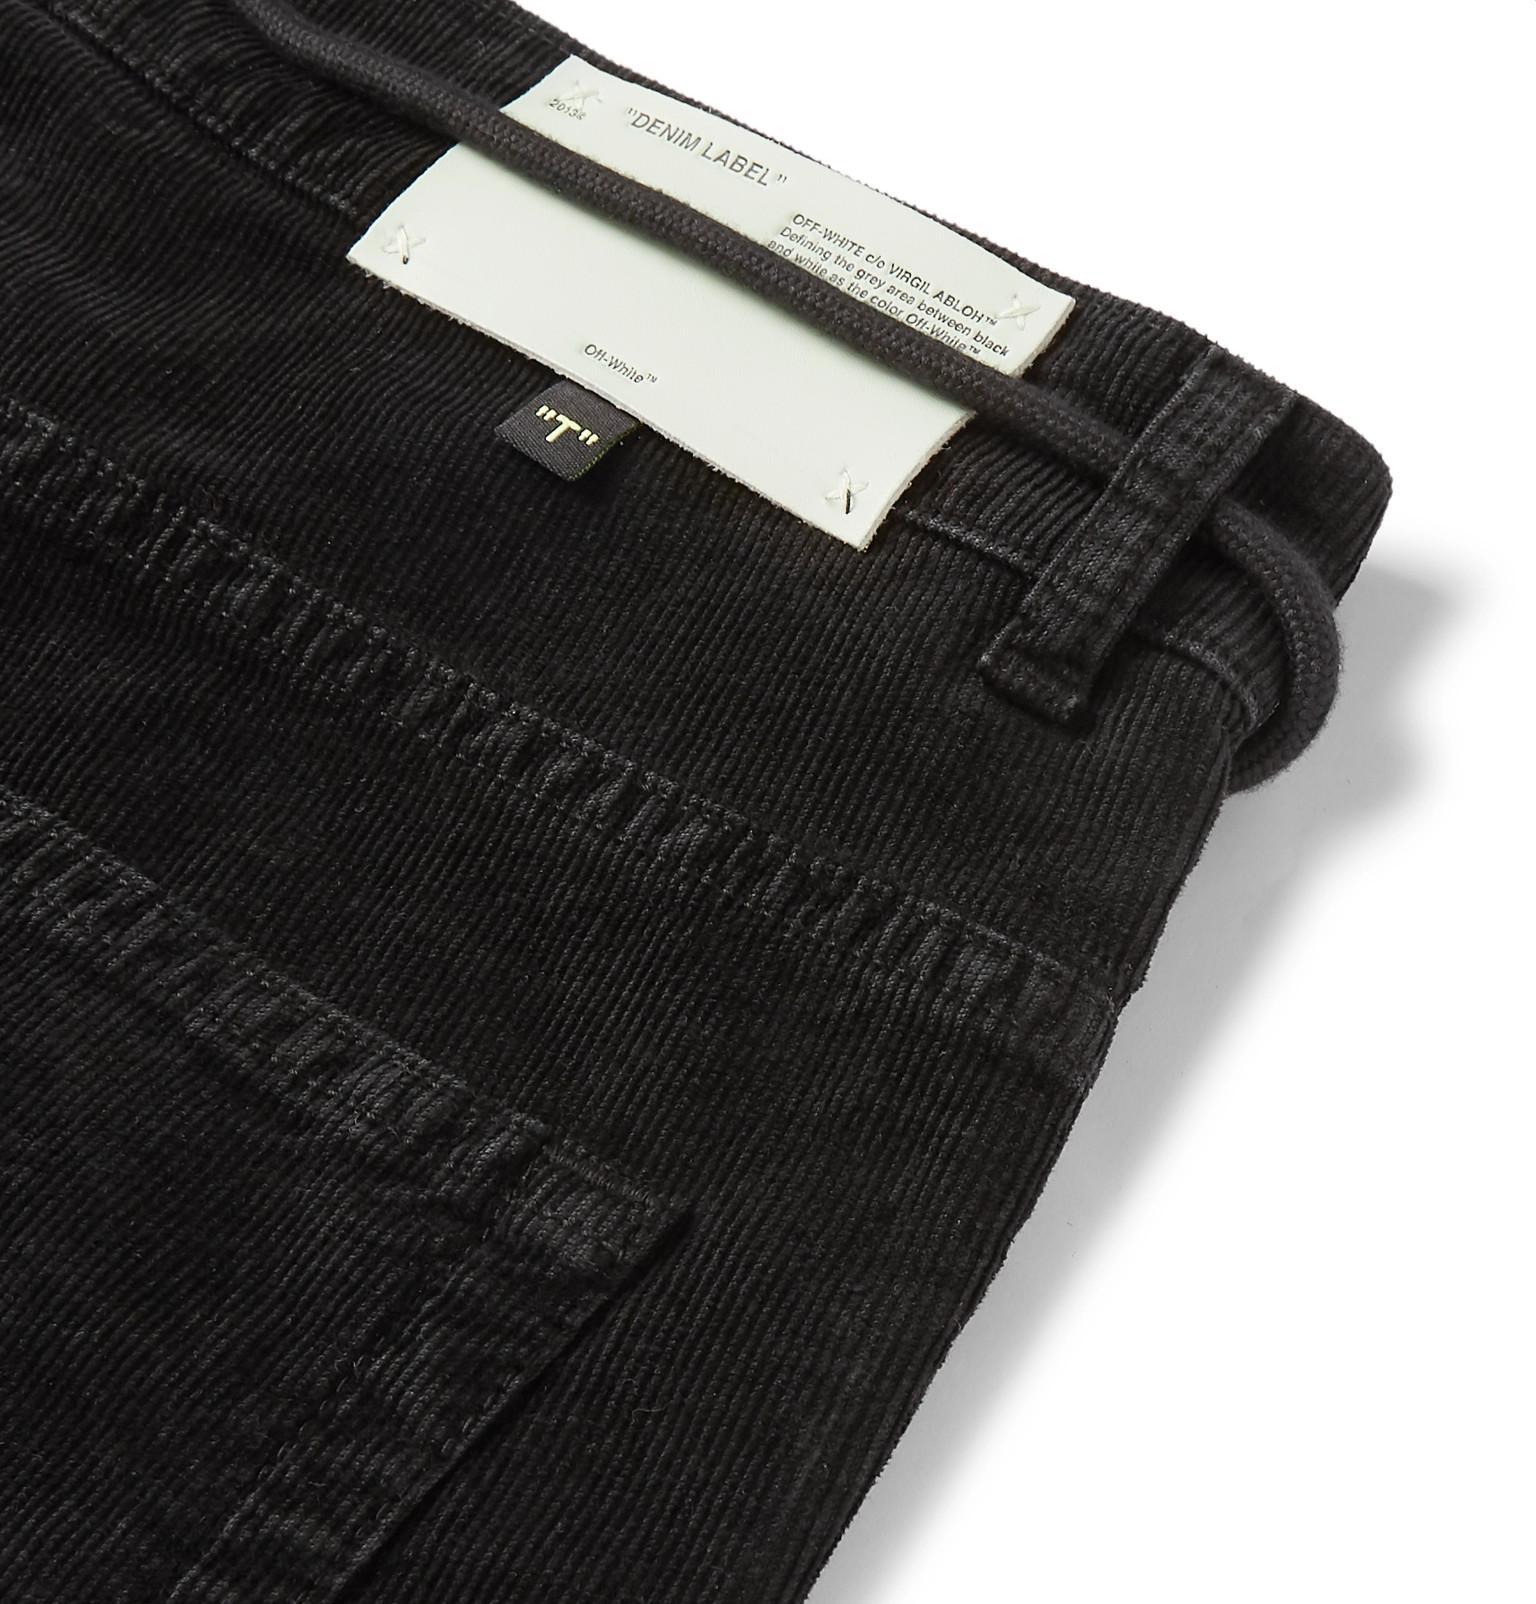 97a18131ef89 Off-White c o Virgil Abloh - Black Slim-fit Stretch Cotton-. View fullscreen